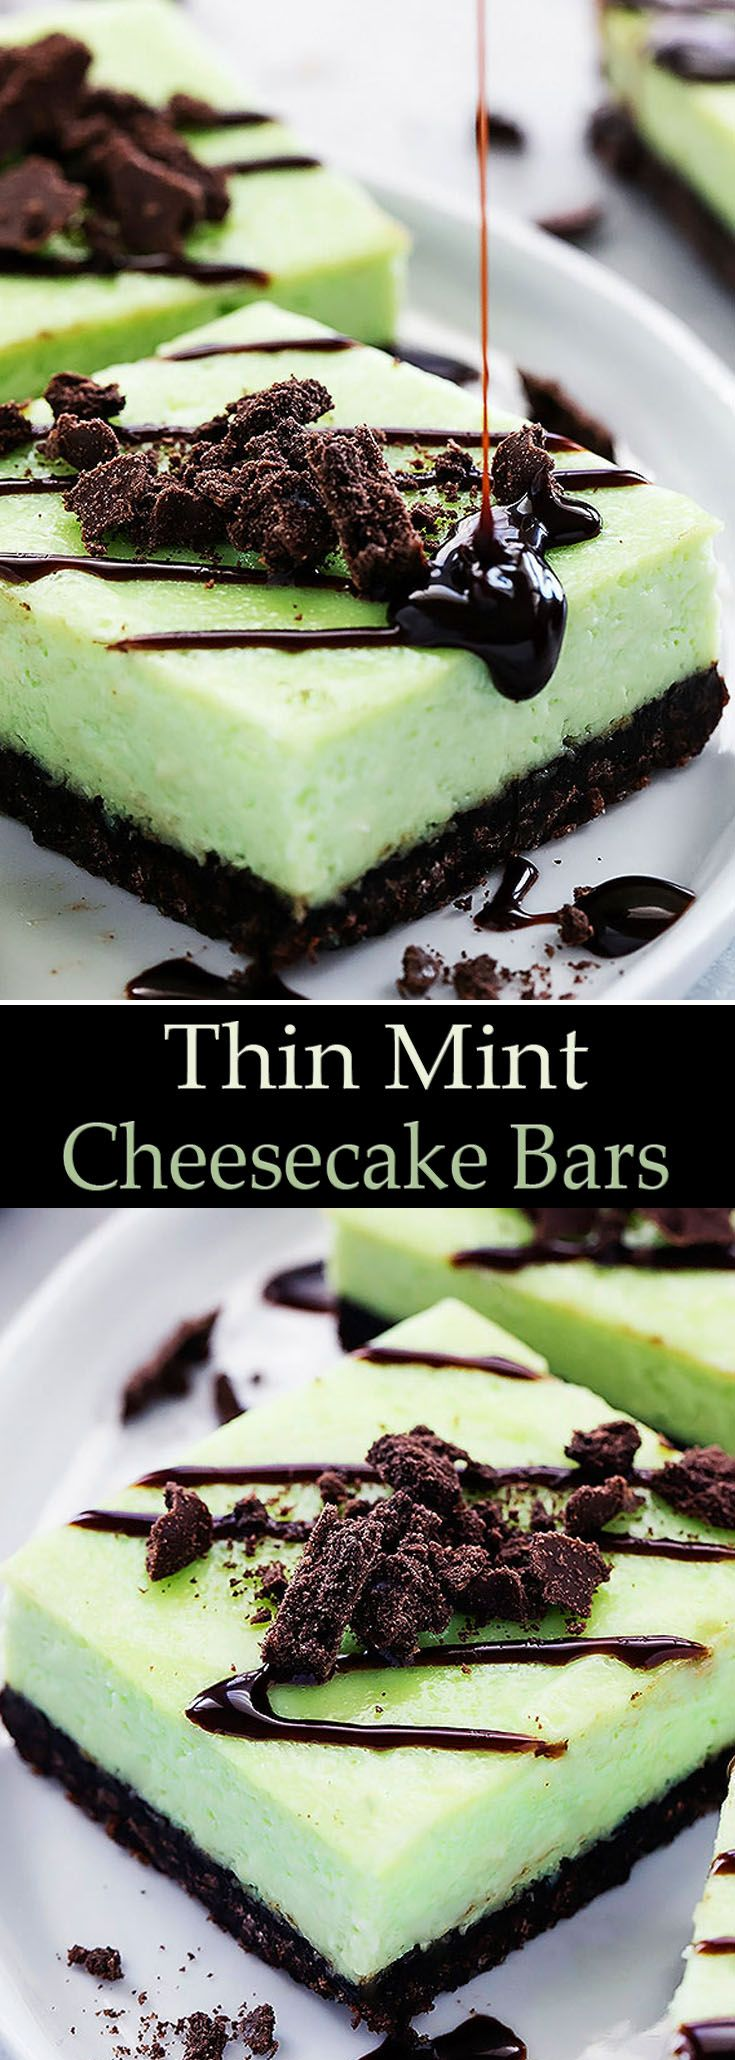 Thin Mint Cheesecake Bars